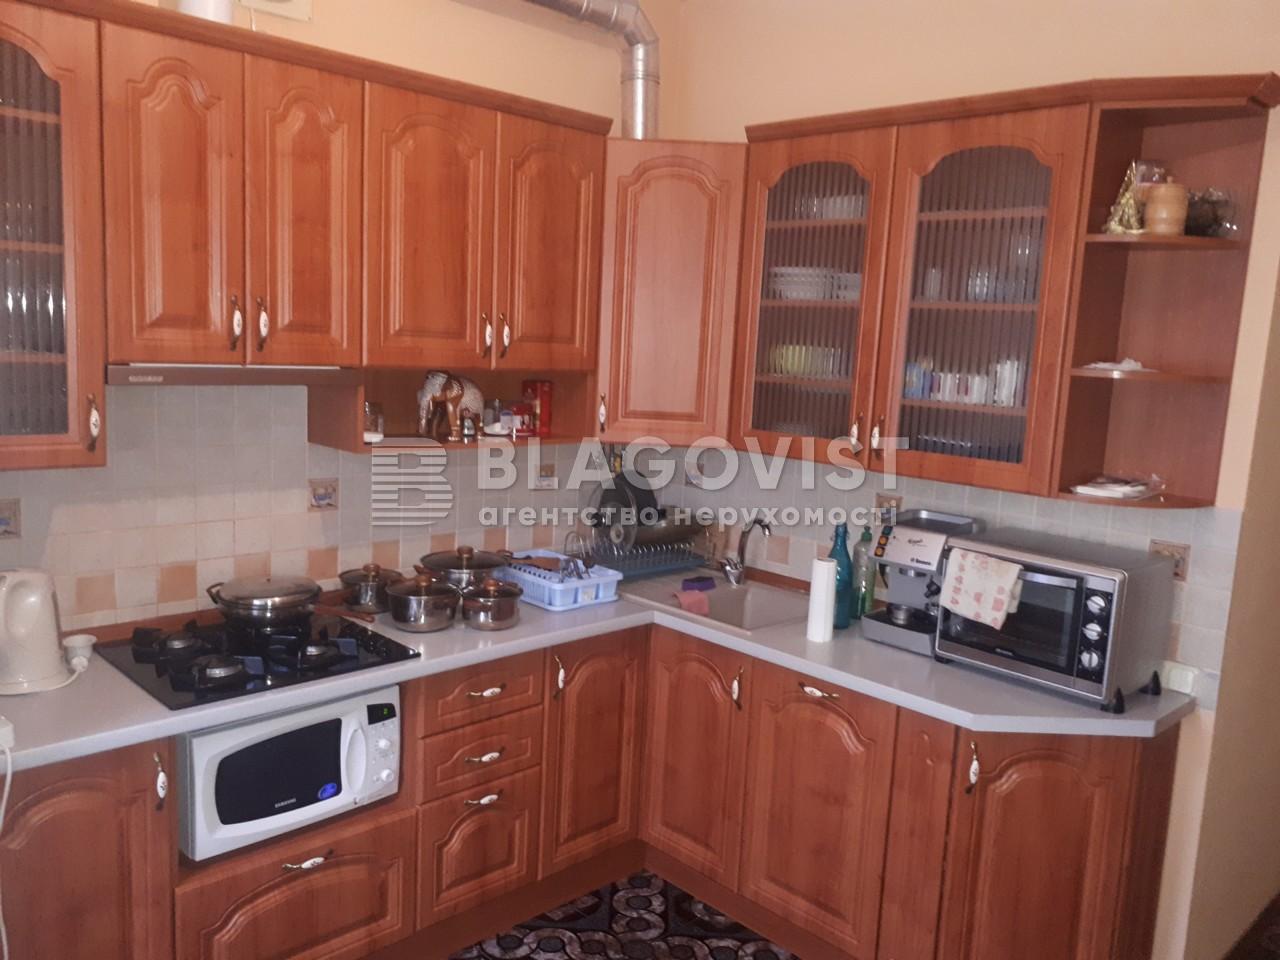 Квартира A-63759, Антоновича (Горького), 14б, Киев - Фото 10